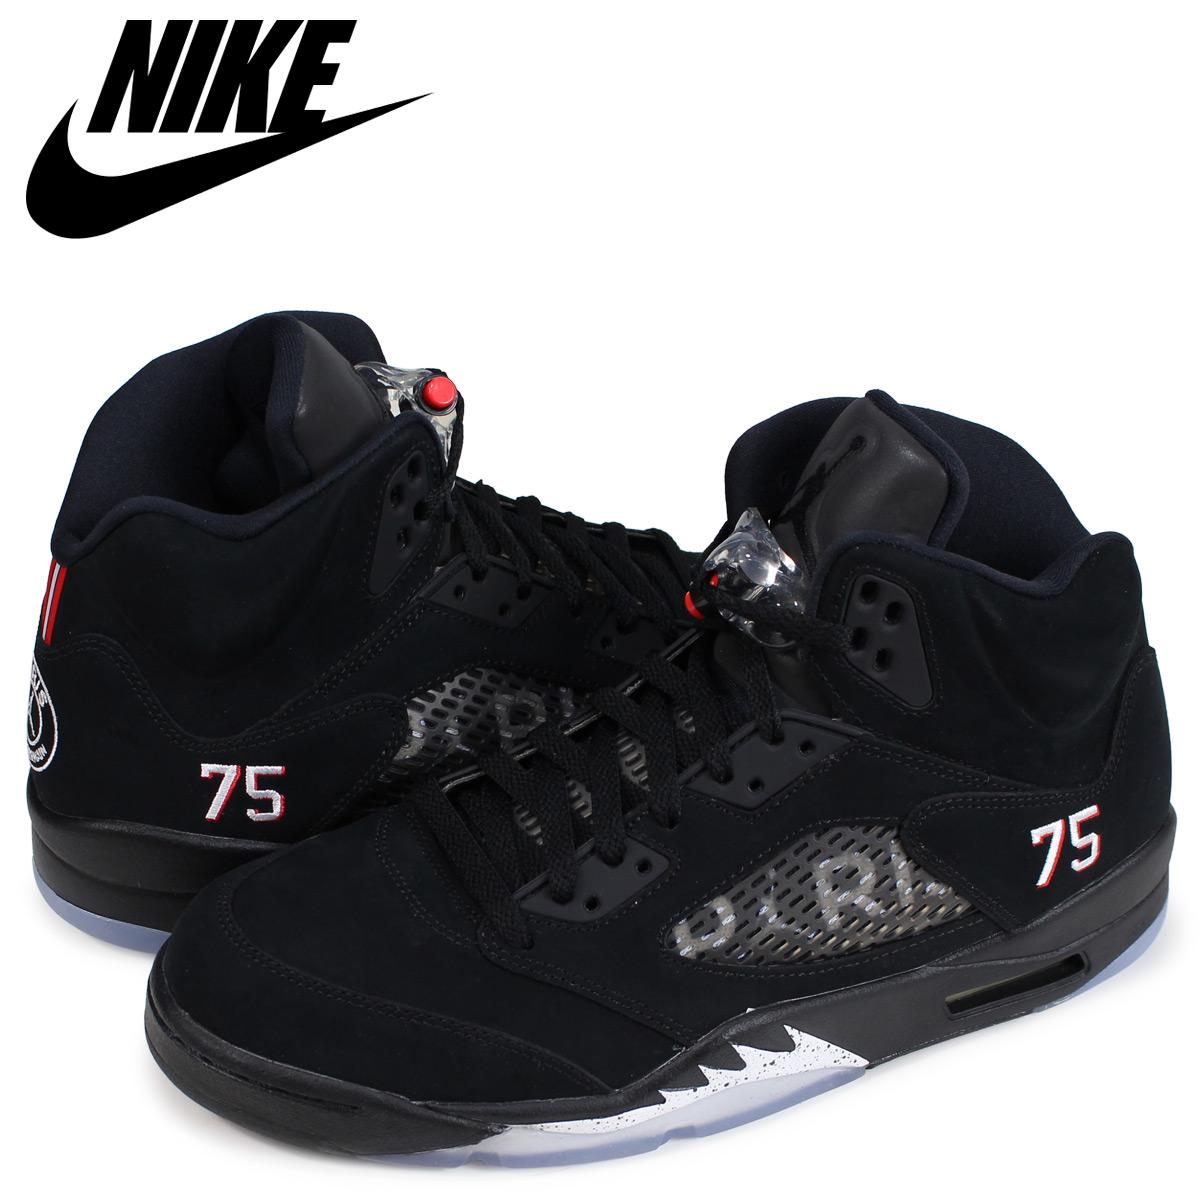 on sale 5c537 68b72 NIKE Nike Air Jordan 5 nostalgic sneakers men AIR JORDAN 5 RETRO BCFC PSG  black black AV9175-001